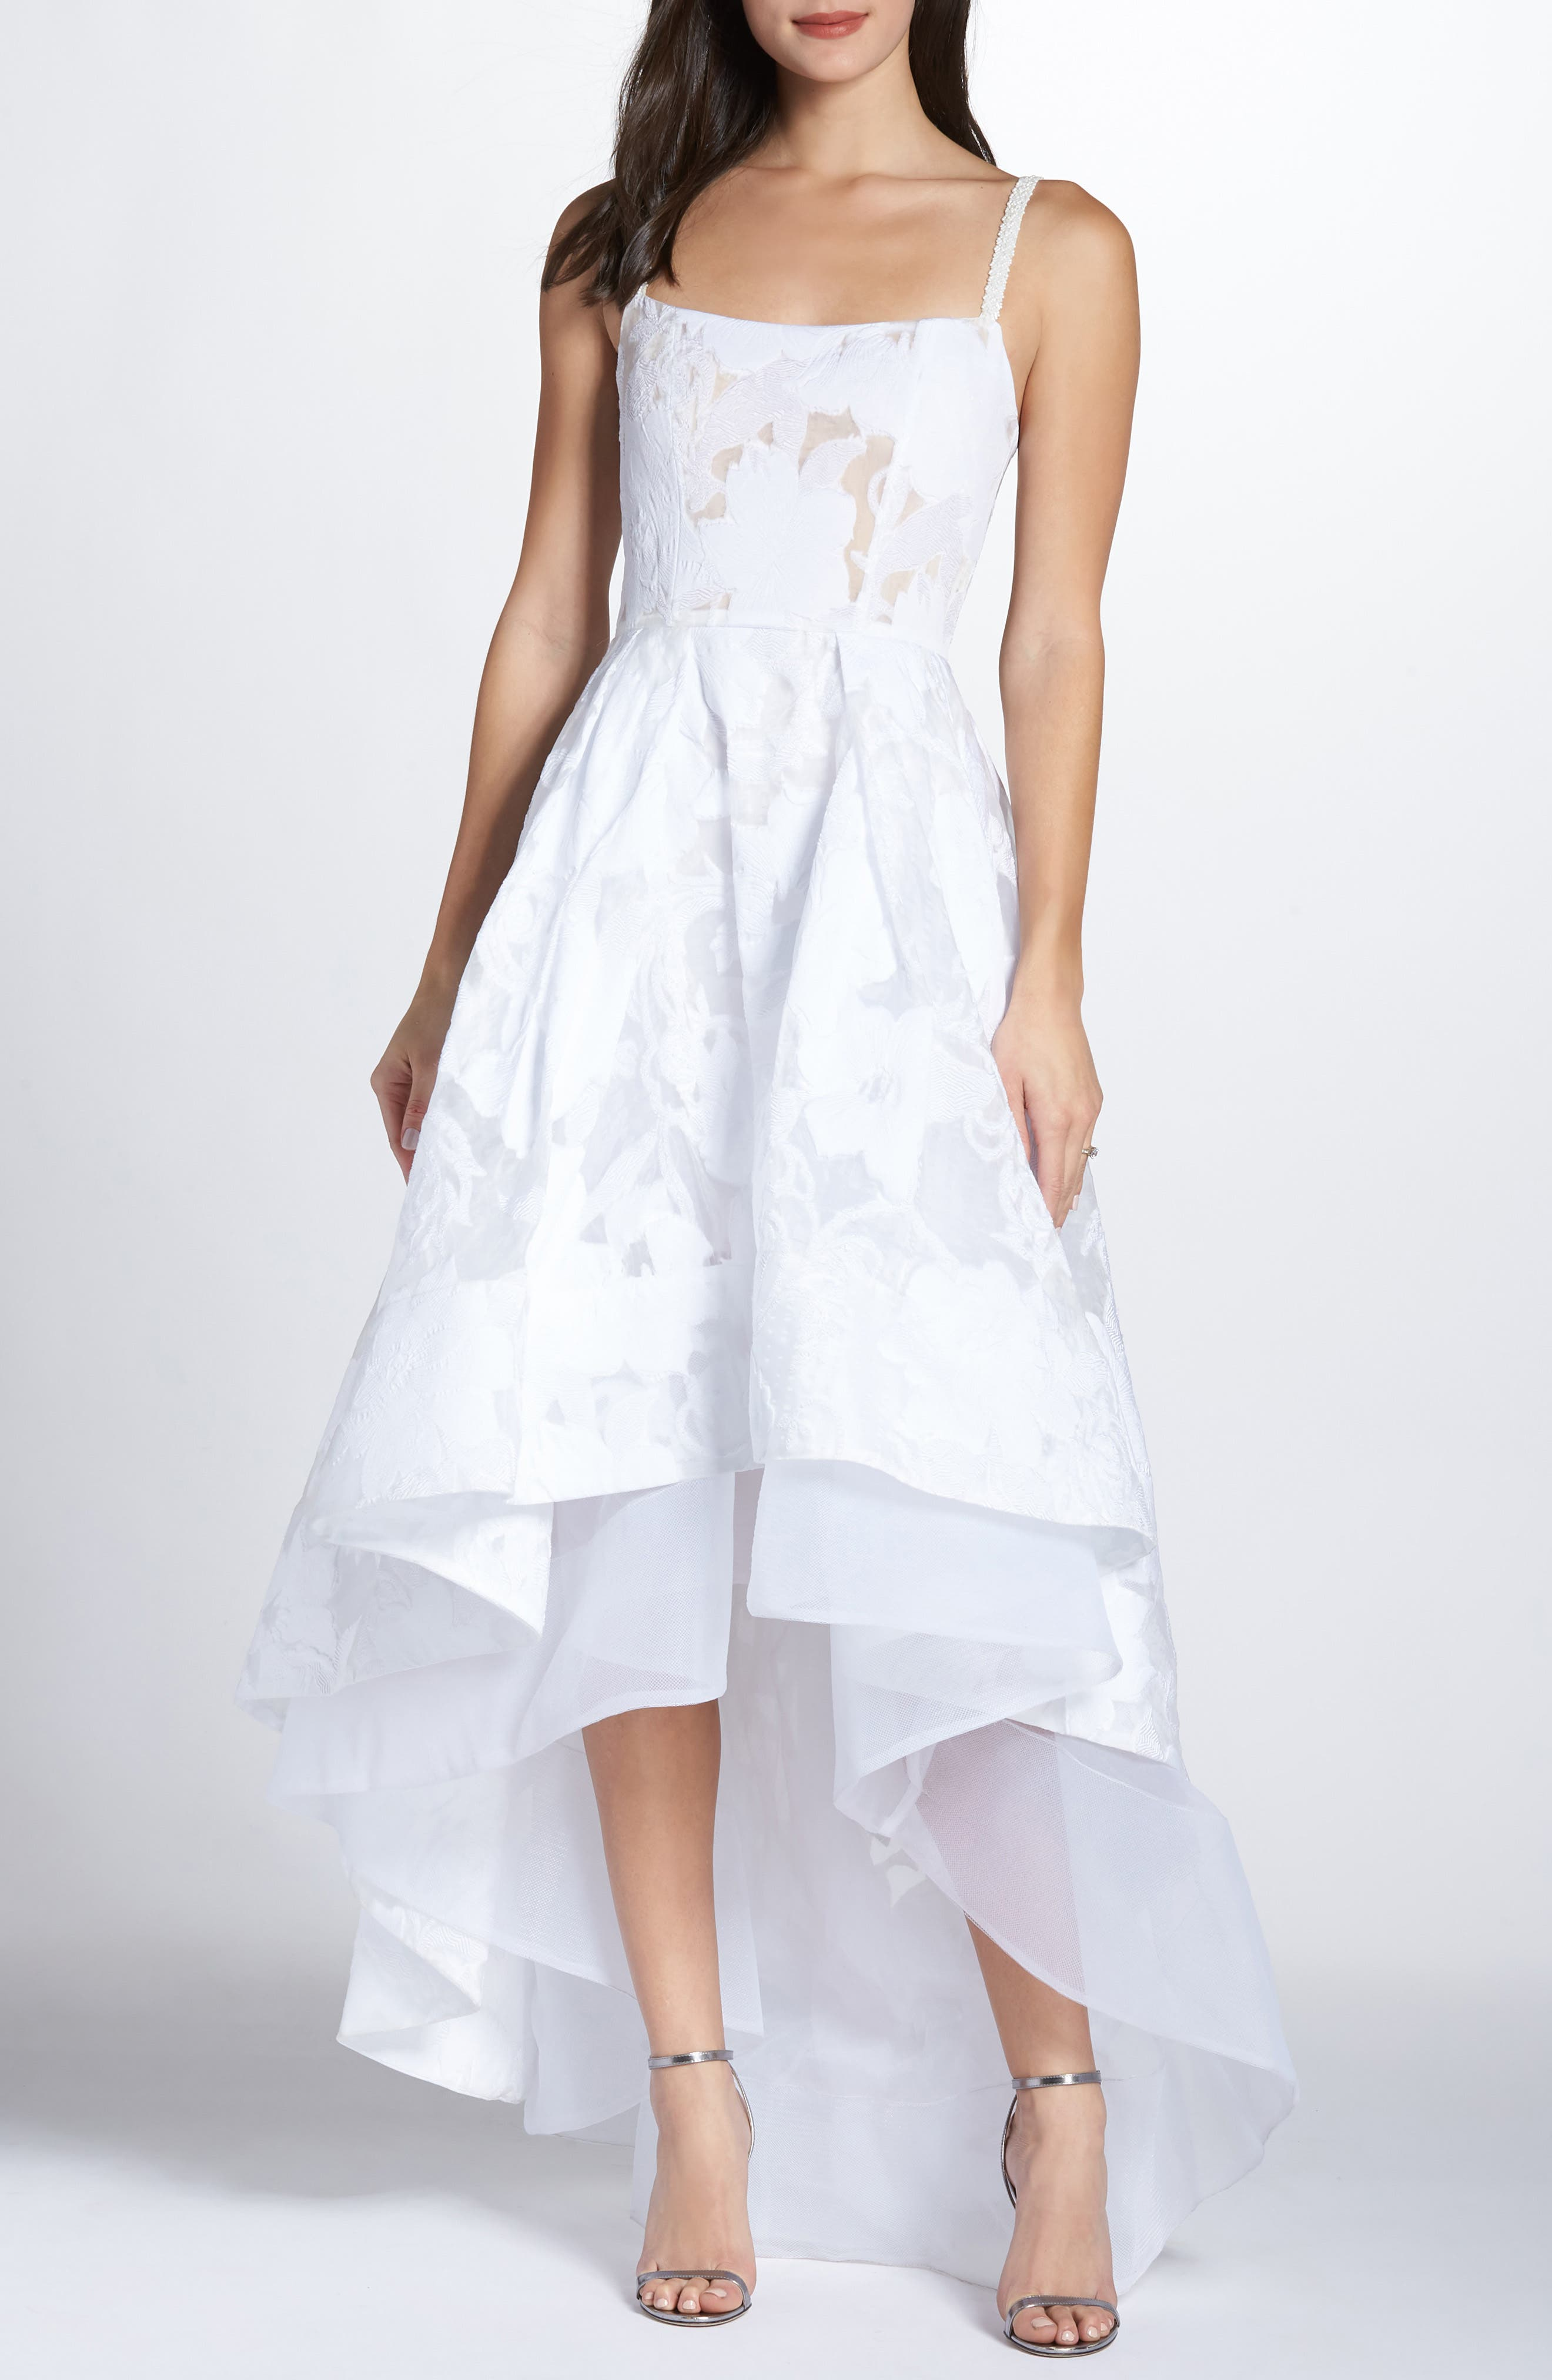 Square Neck Dresses